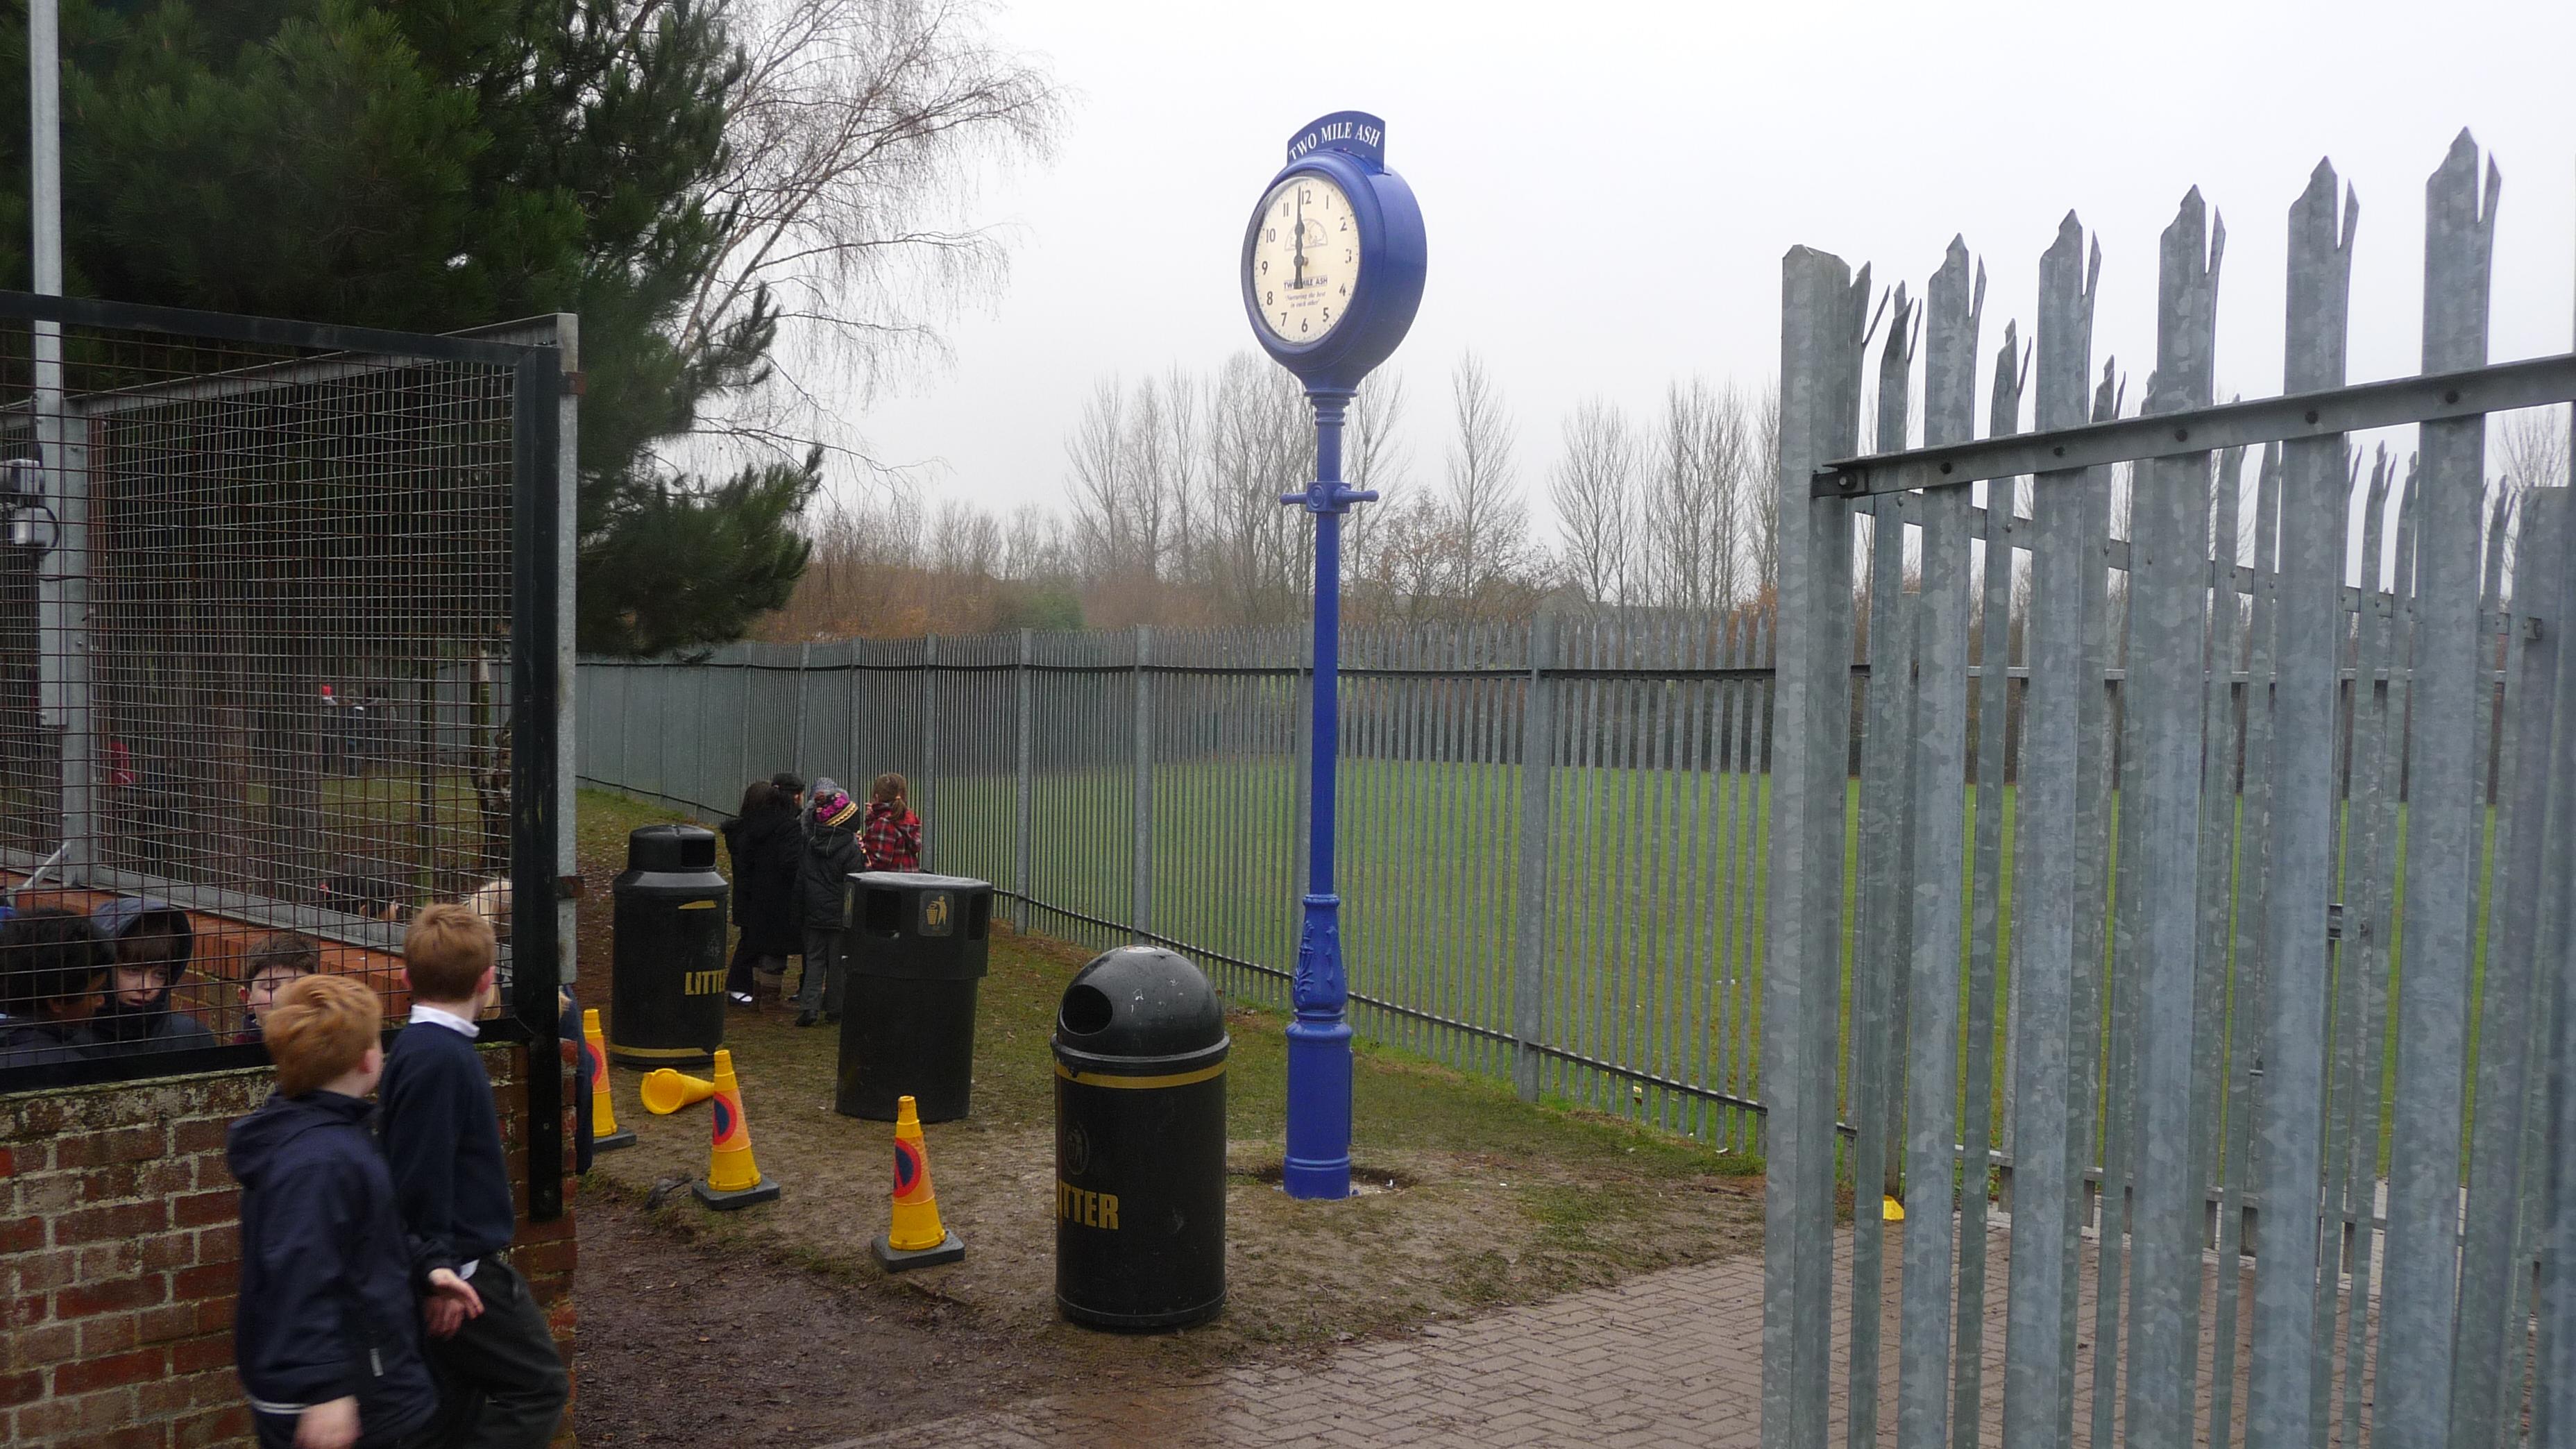 Installing a school pillar clock